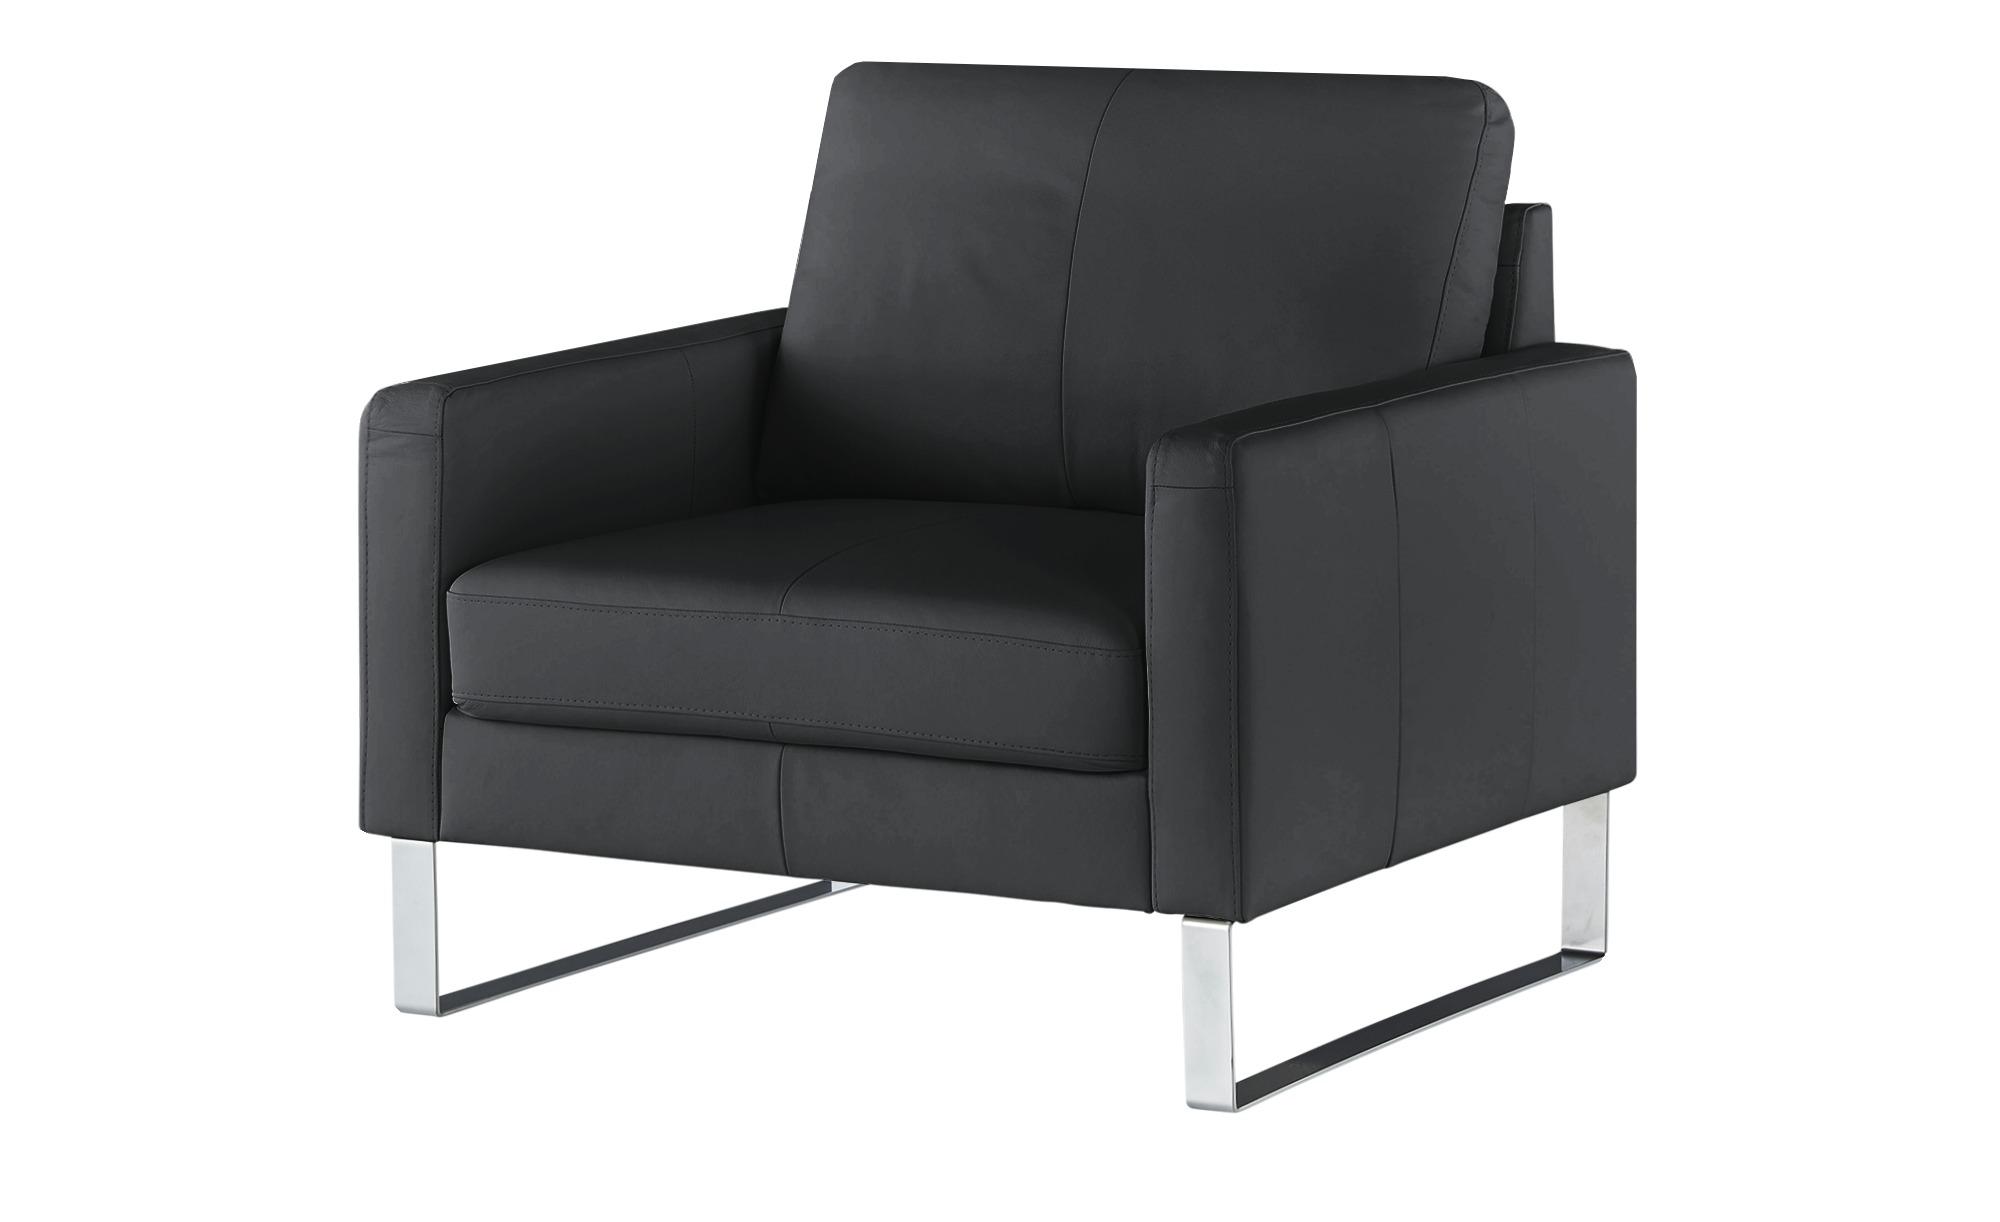 Sessel  Rajaa ¦ schwarz ¦ Maße (cm): B: 100 H: 90 T: 93 Polstermöbel > Sessel > Ledersessel - Höffner